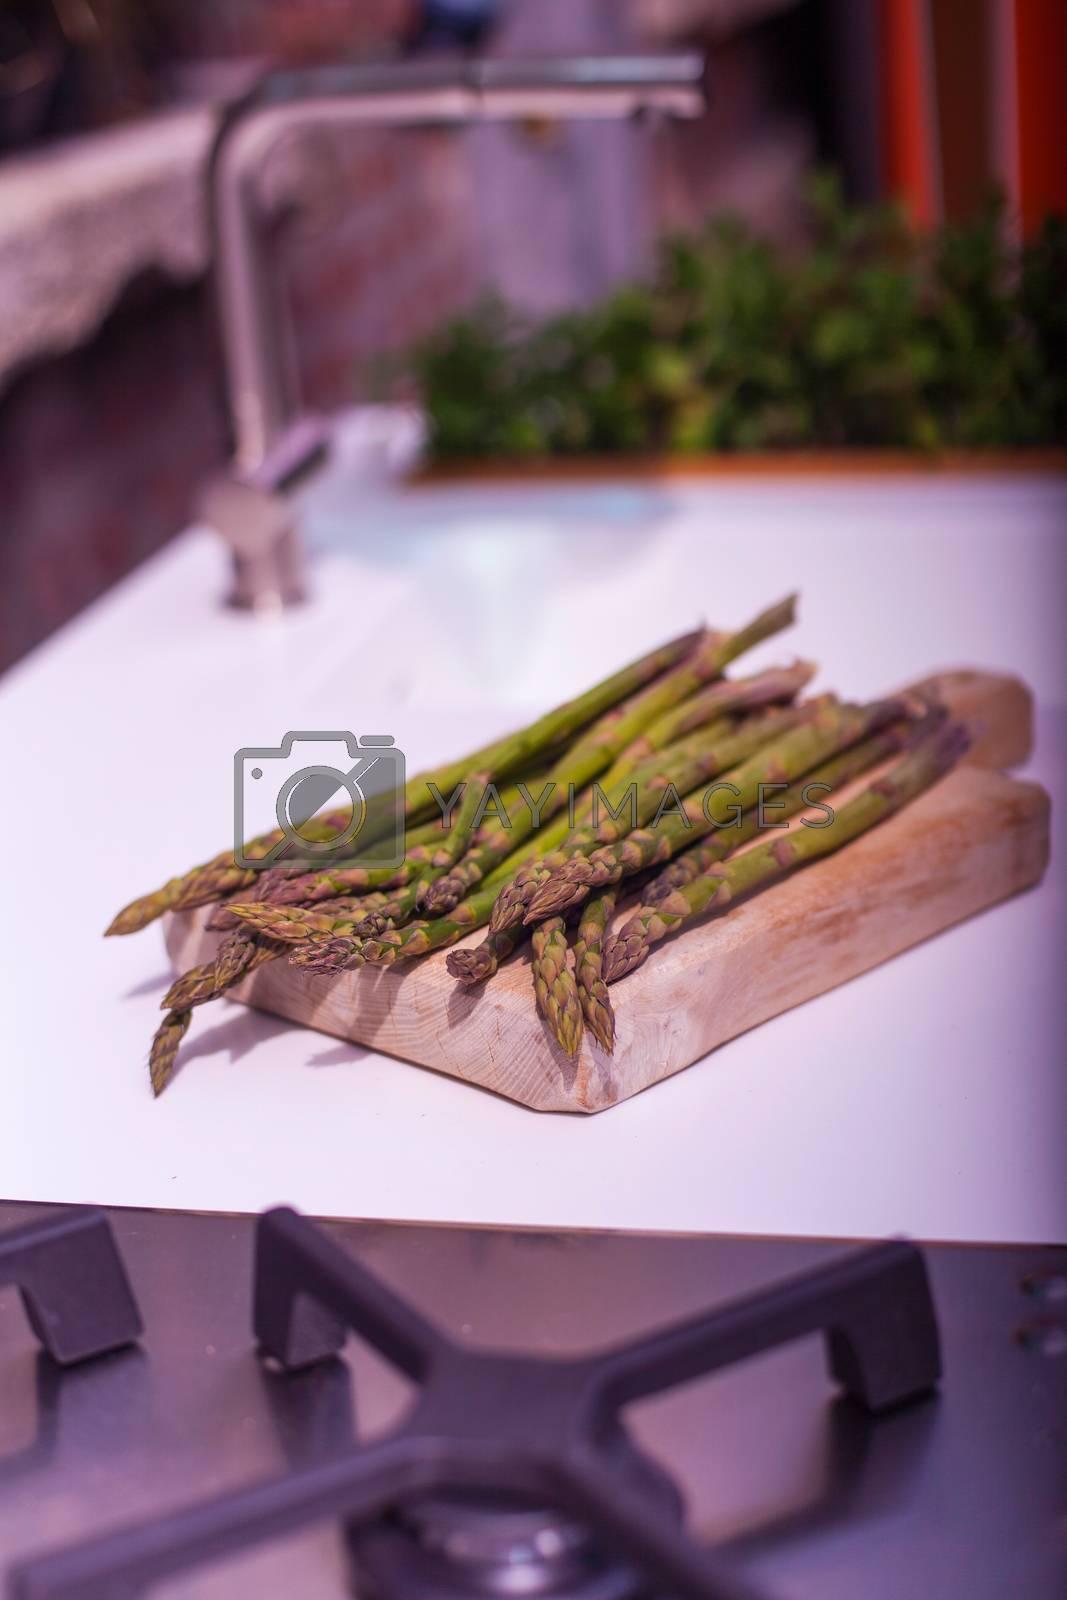 Asparagus by bepsimage